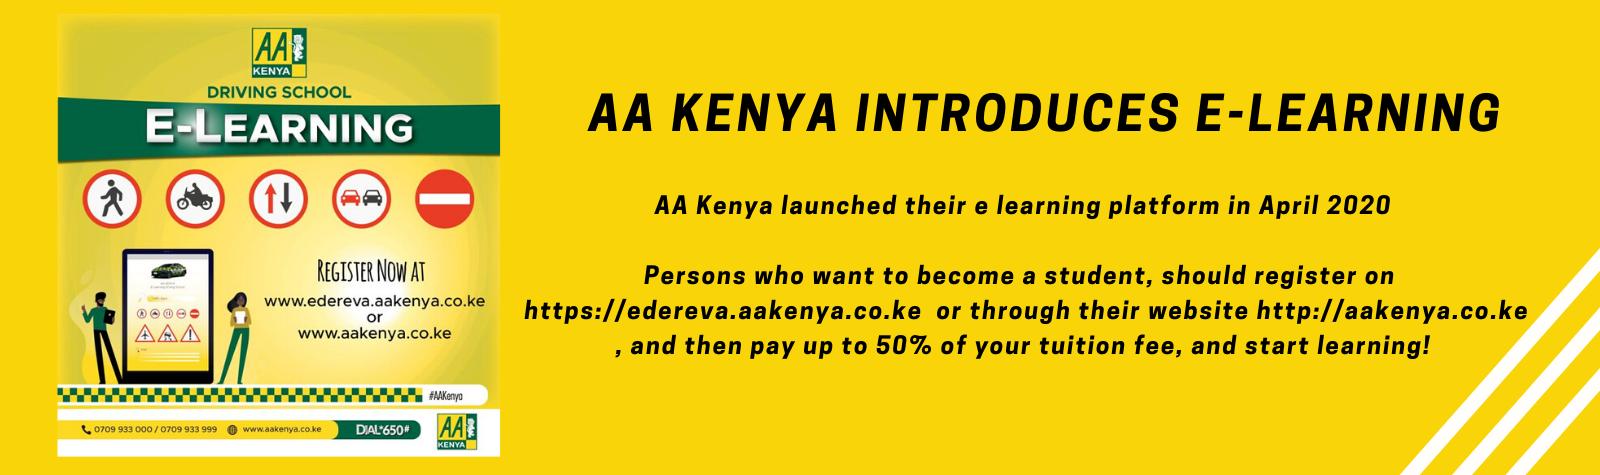 AA-Kenya-launches-elearning-driver-training-2020